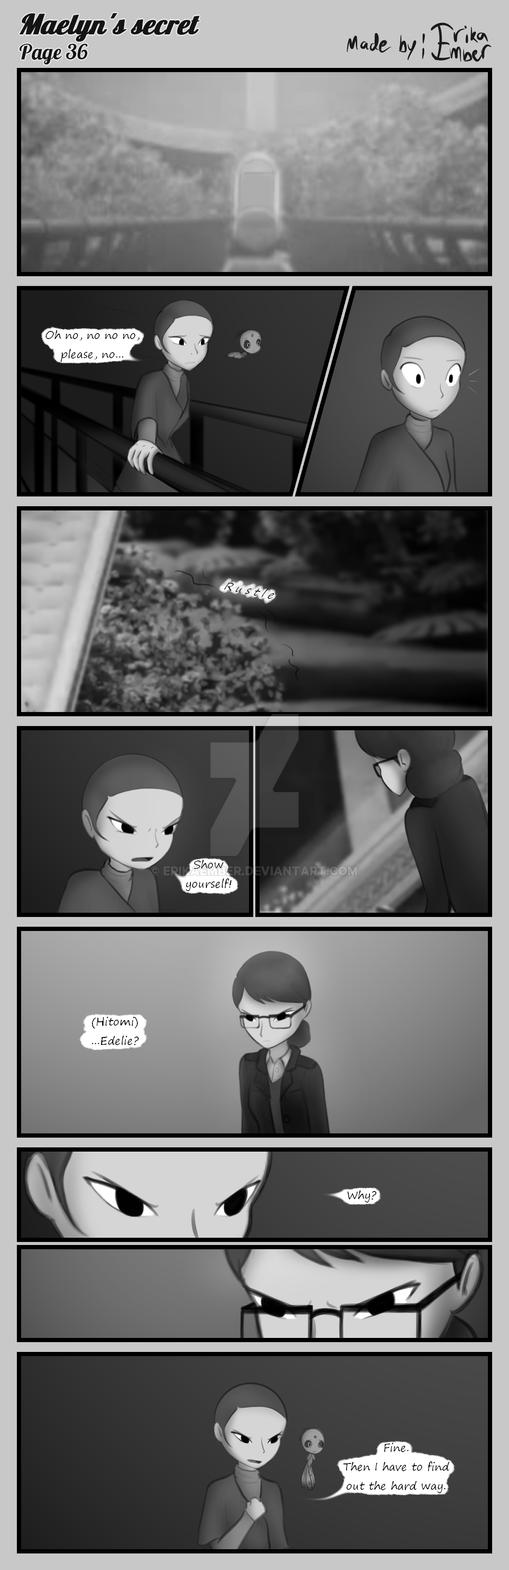 Maelyn's Secret - Page 36